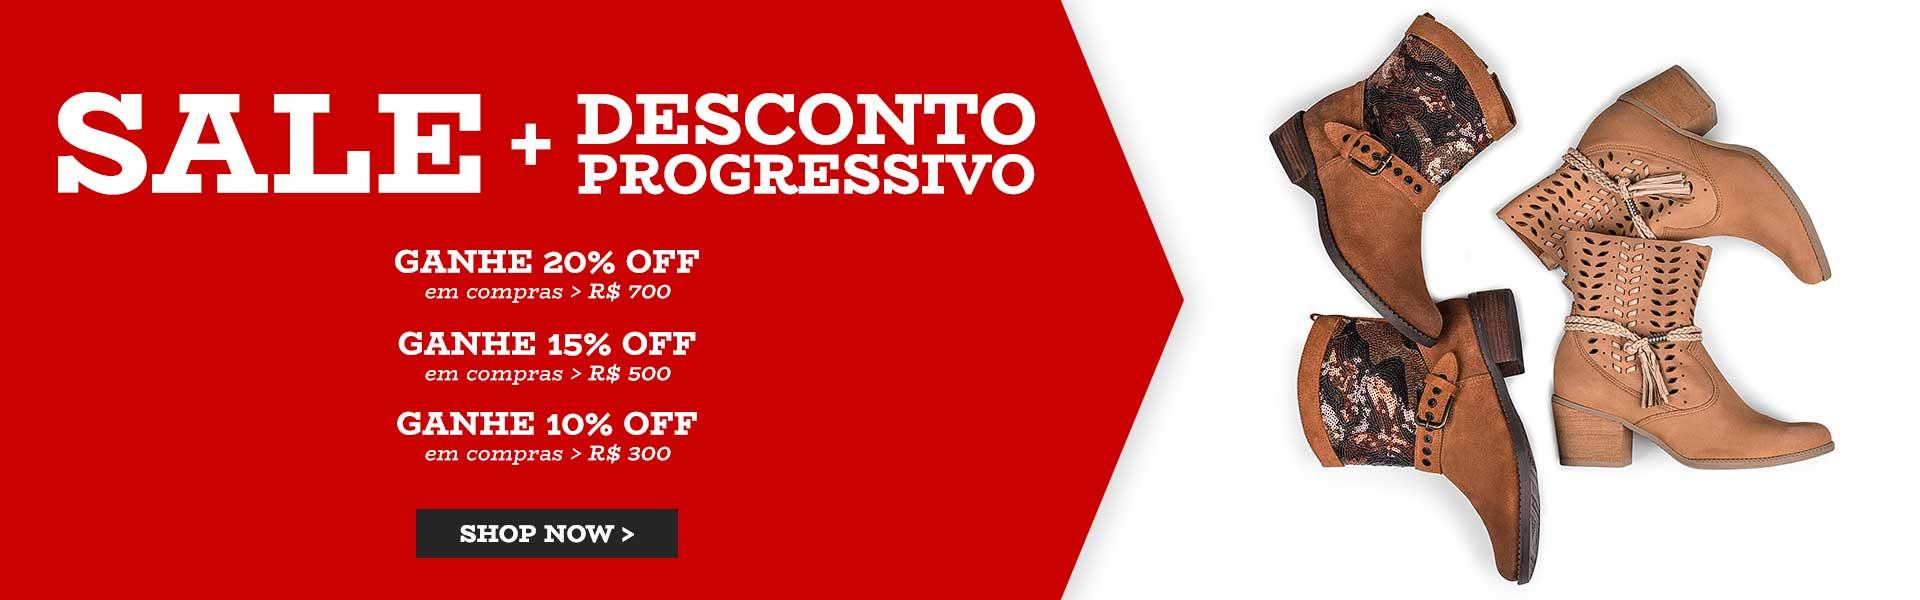 Sale + Desconto Progressivo